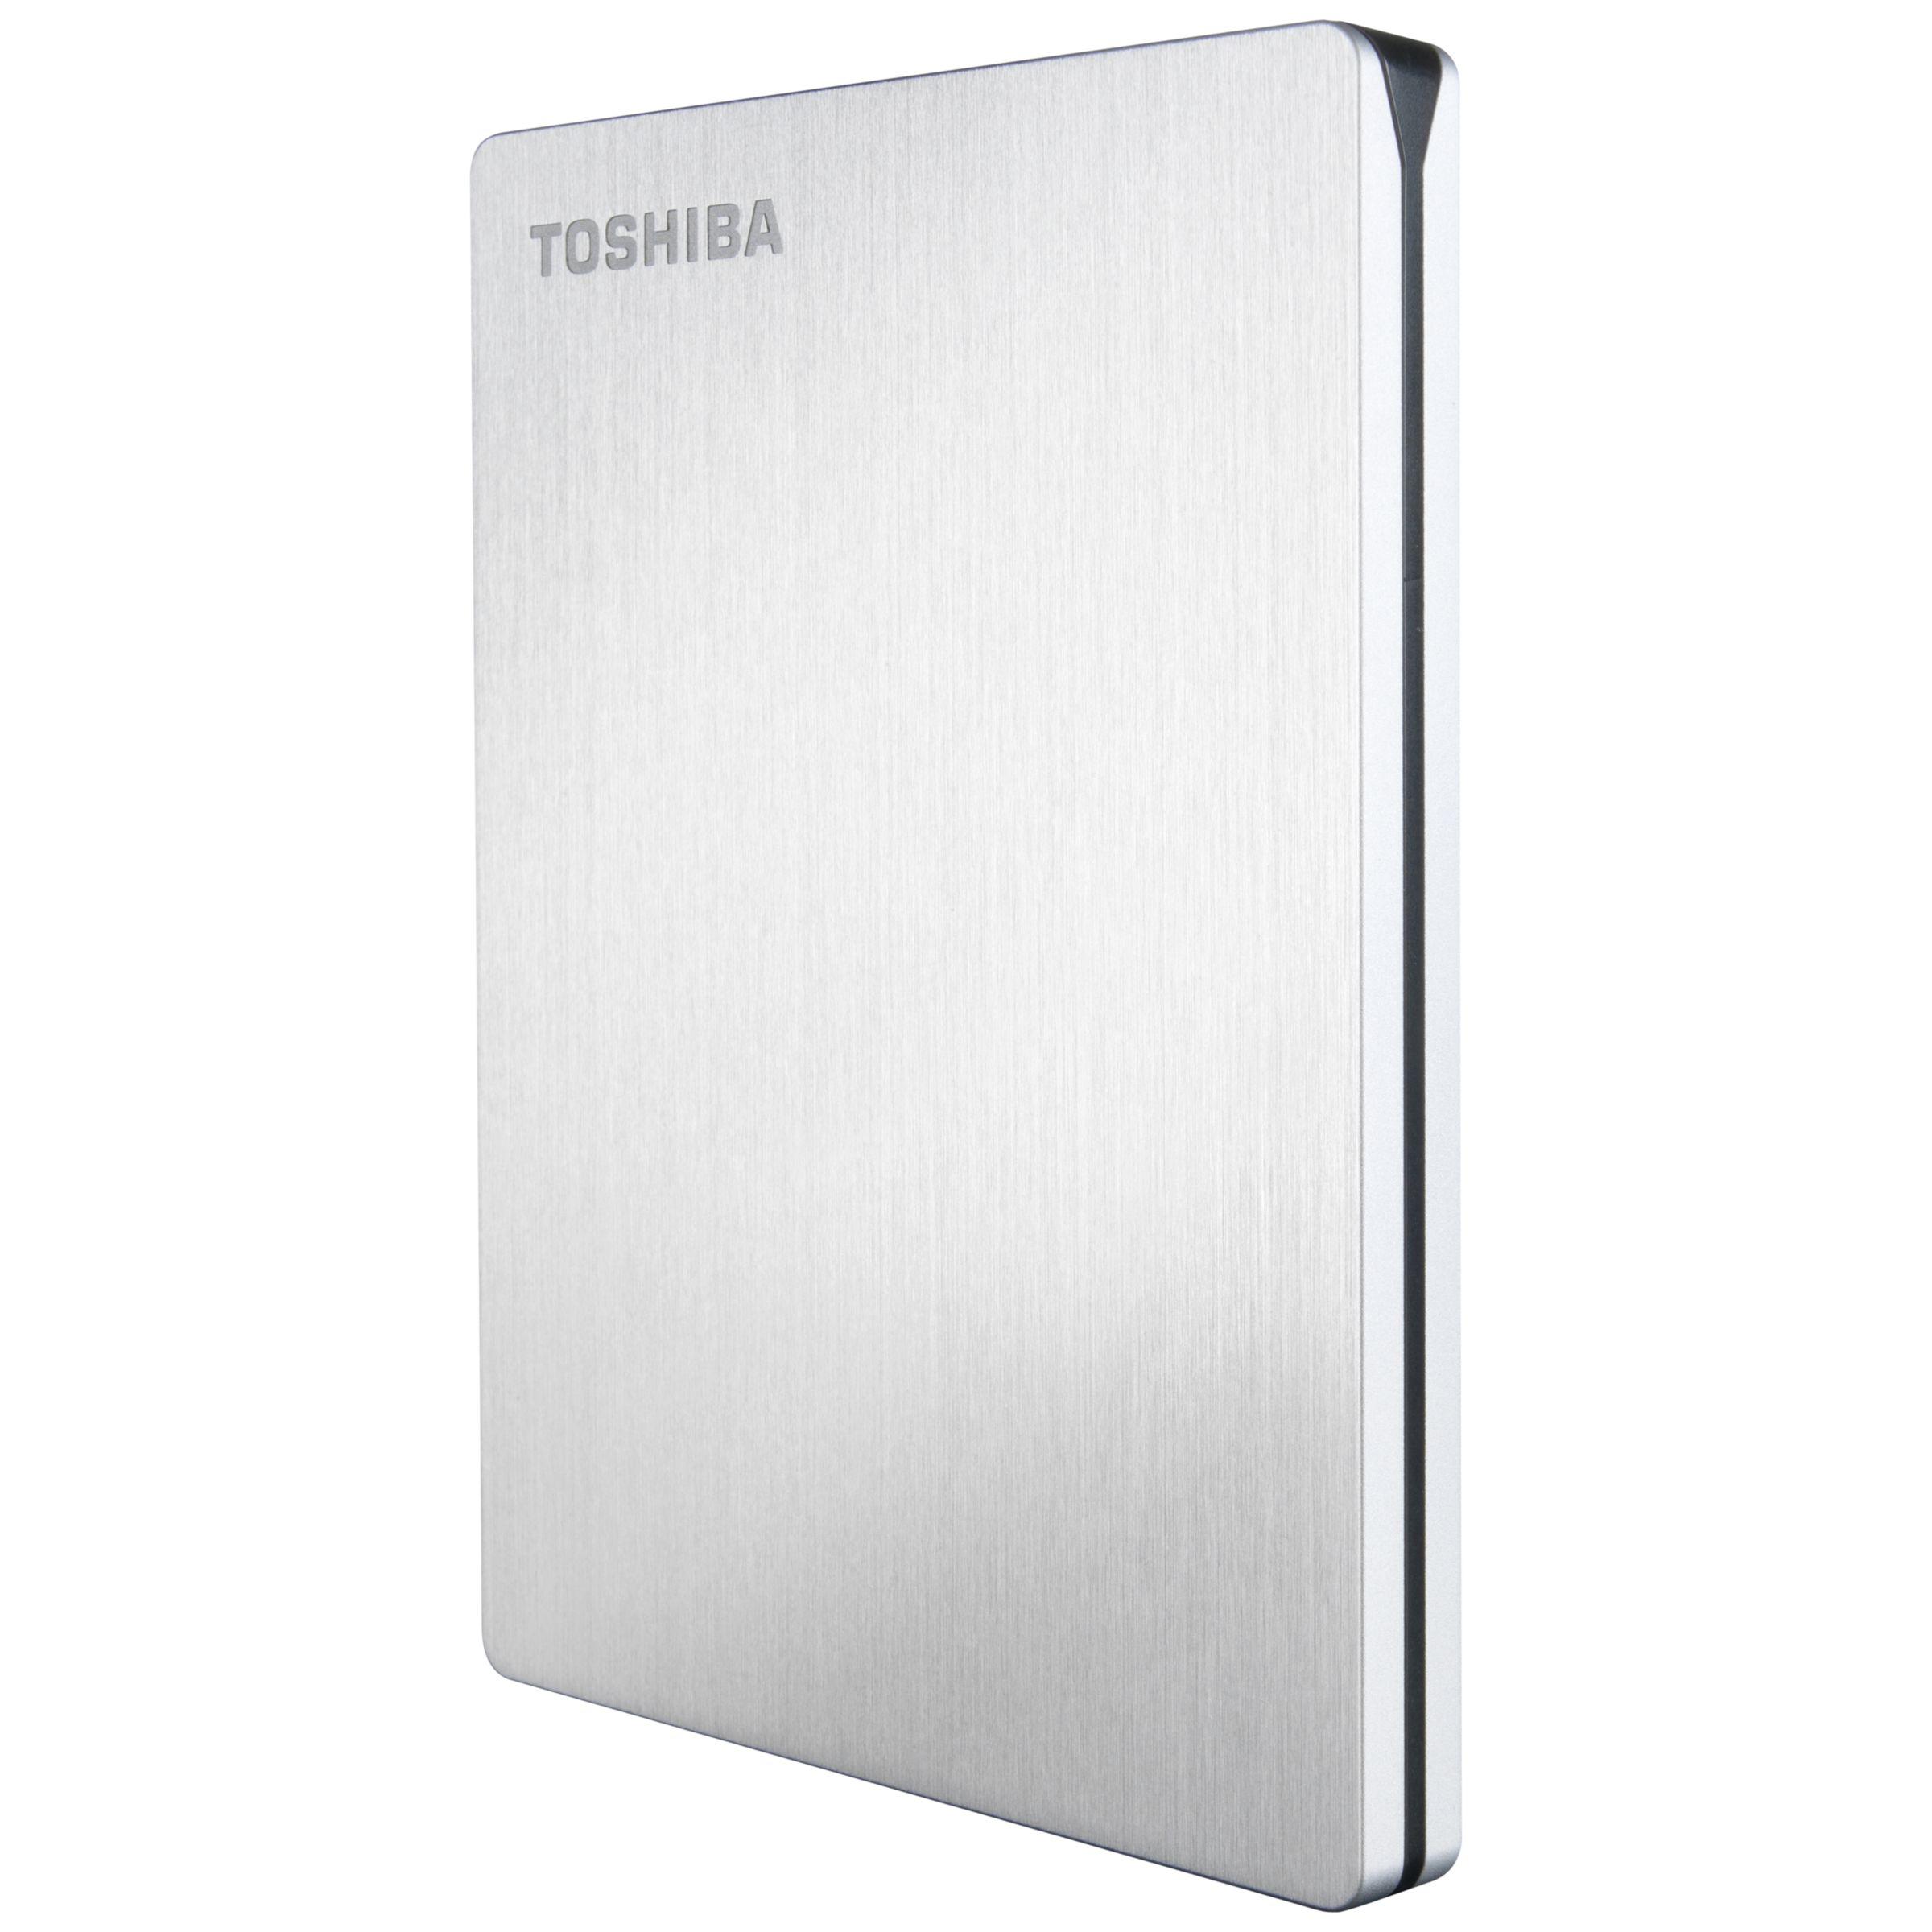 Toshiba Toshiba Slim Portable Hard Drive, USB 3.0, 1TB, Silver